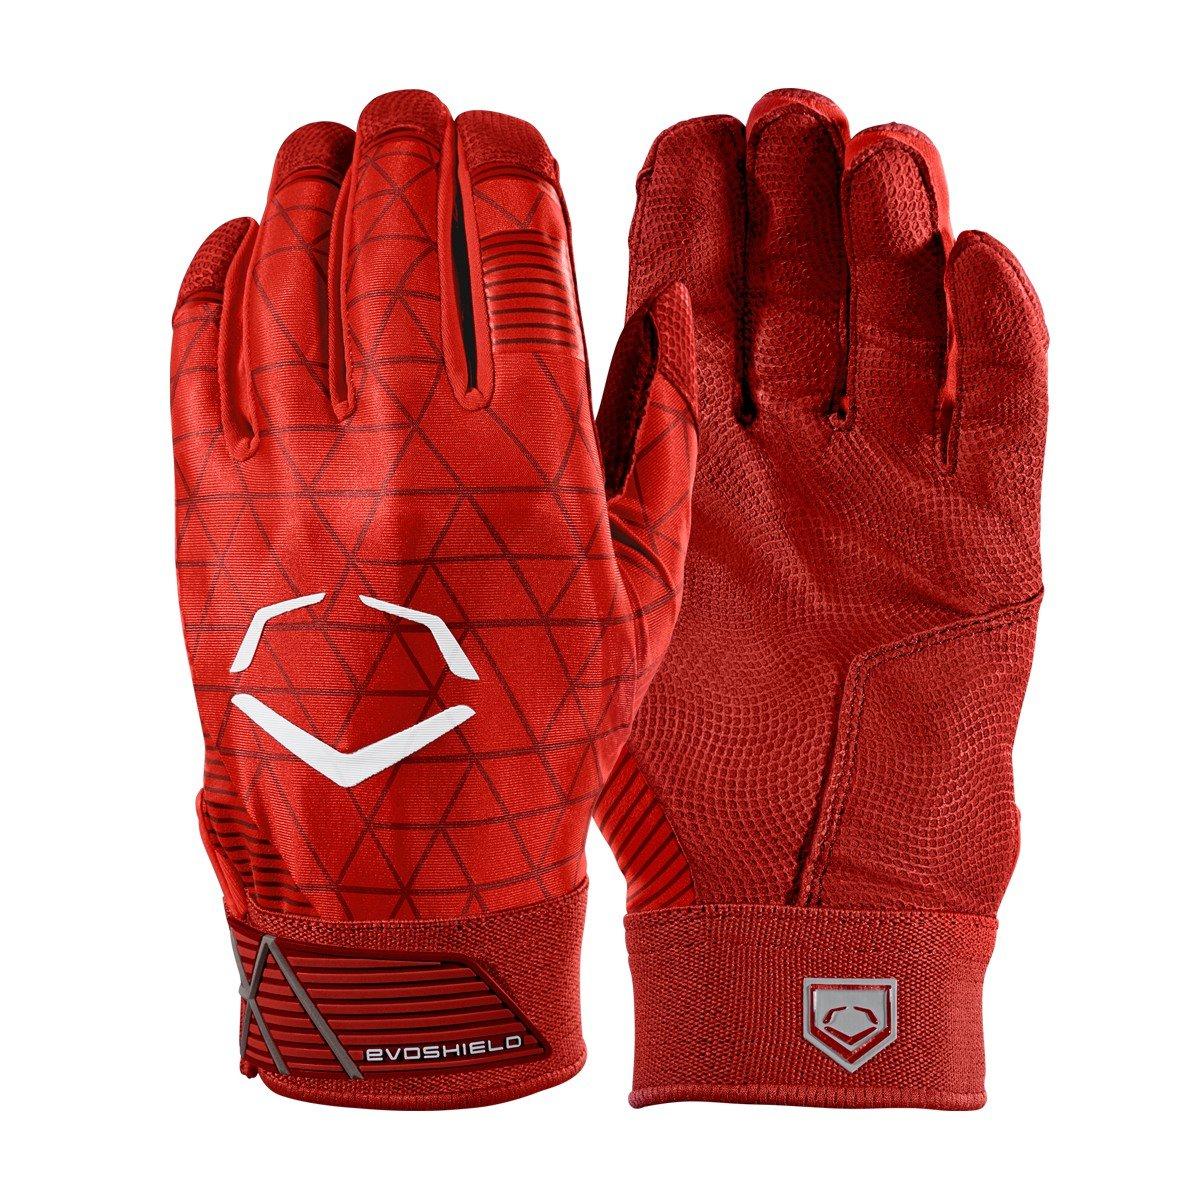 Evoshield evocharge保護用バッティング手袋 B0741JS3RC Small|レッド|アダルト レッド Small